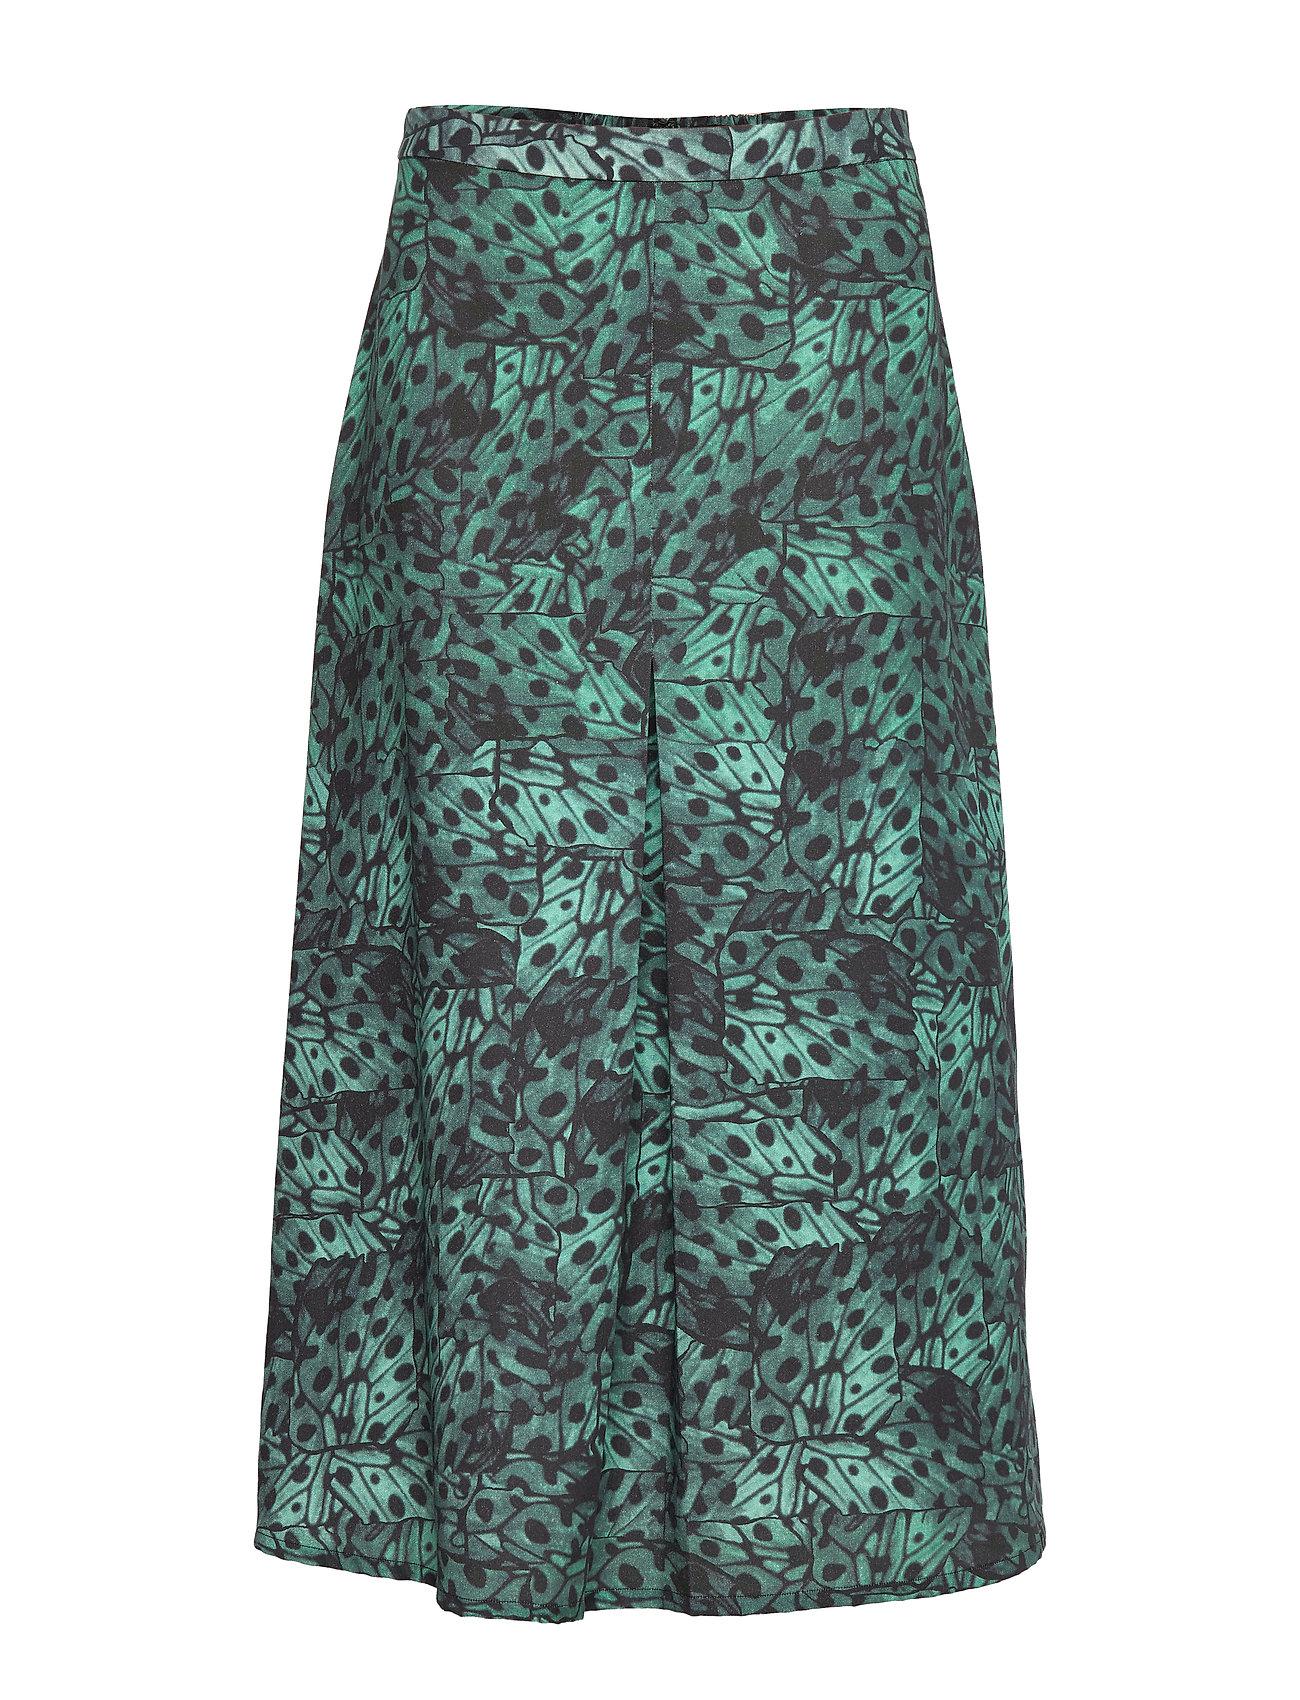 Residus Nisha Skirt - ANTIQUE GREEN